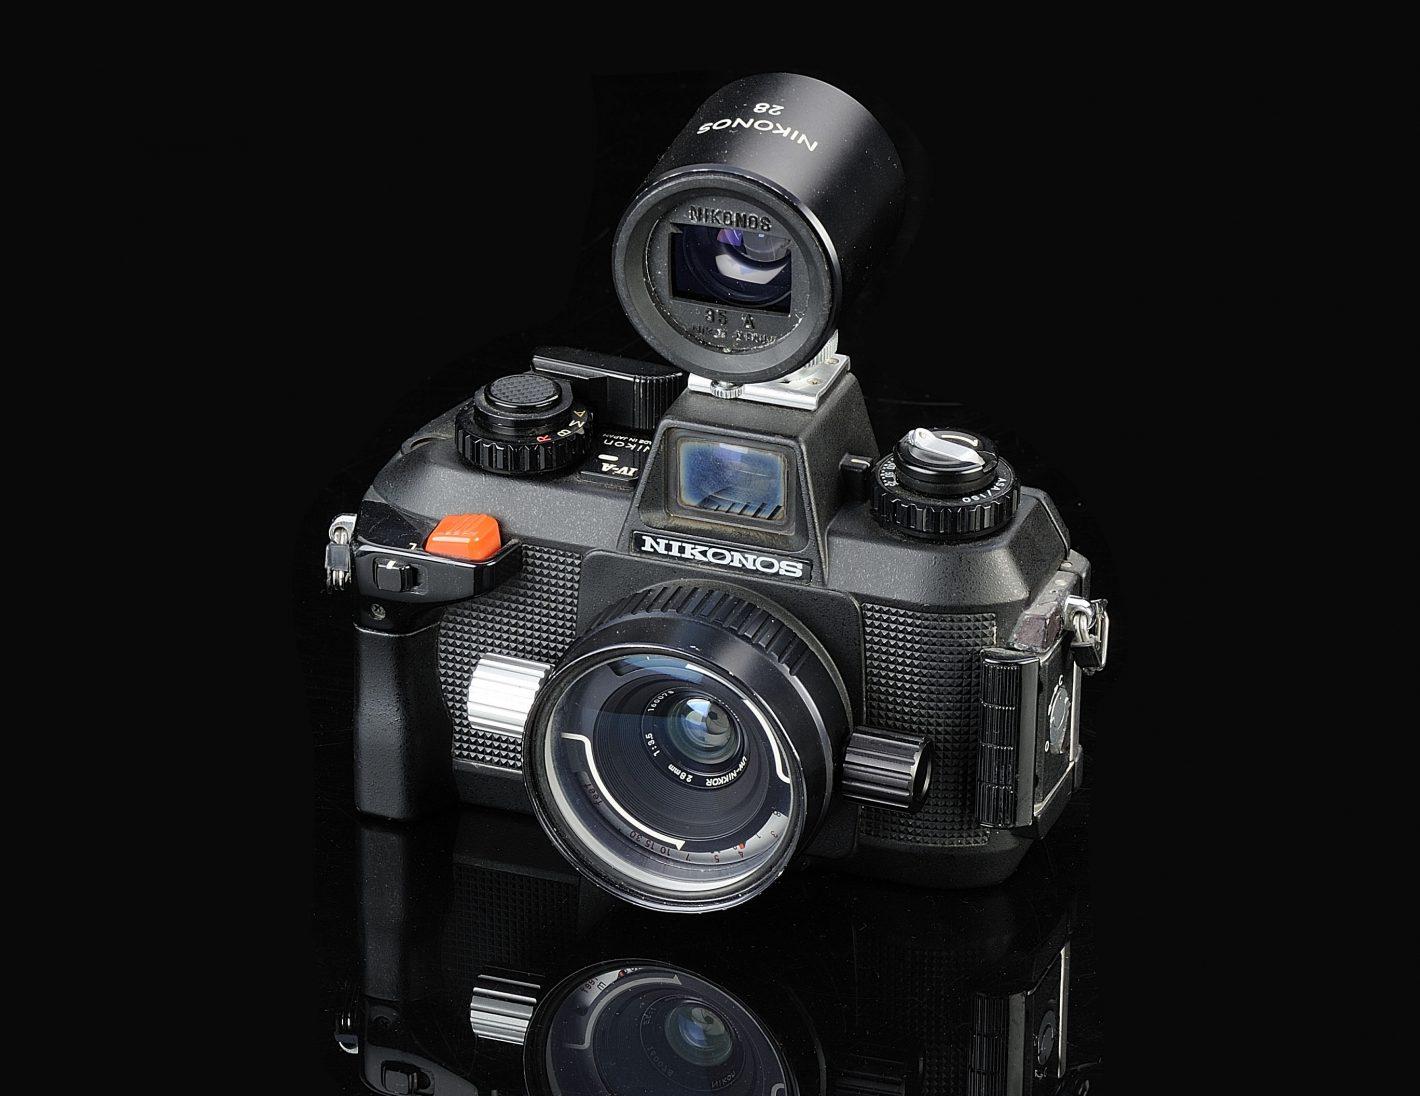 Nikonos Nikon Thierry Ravassod